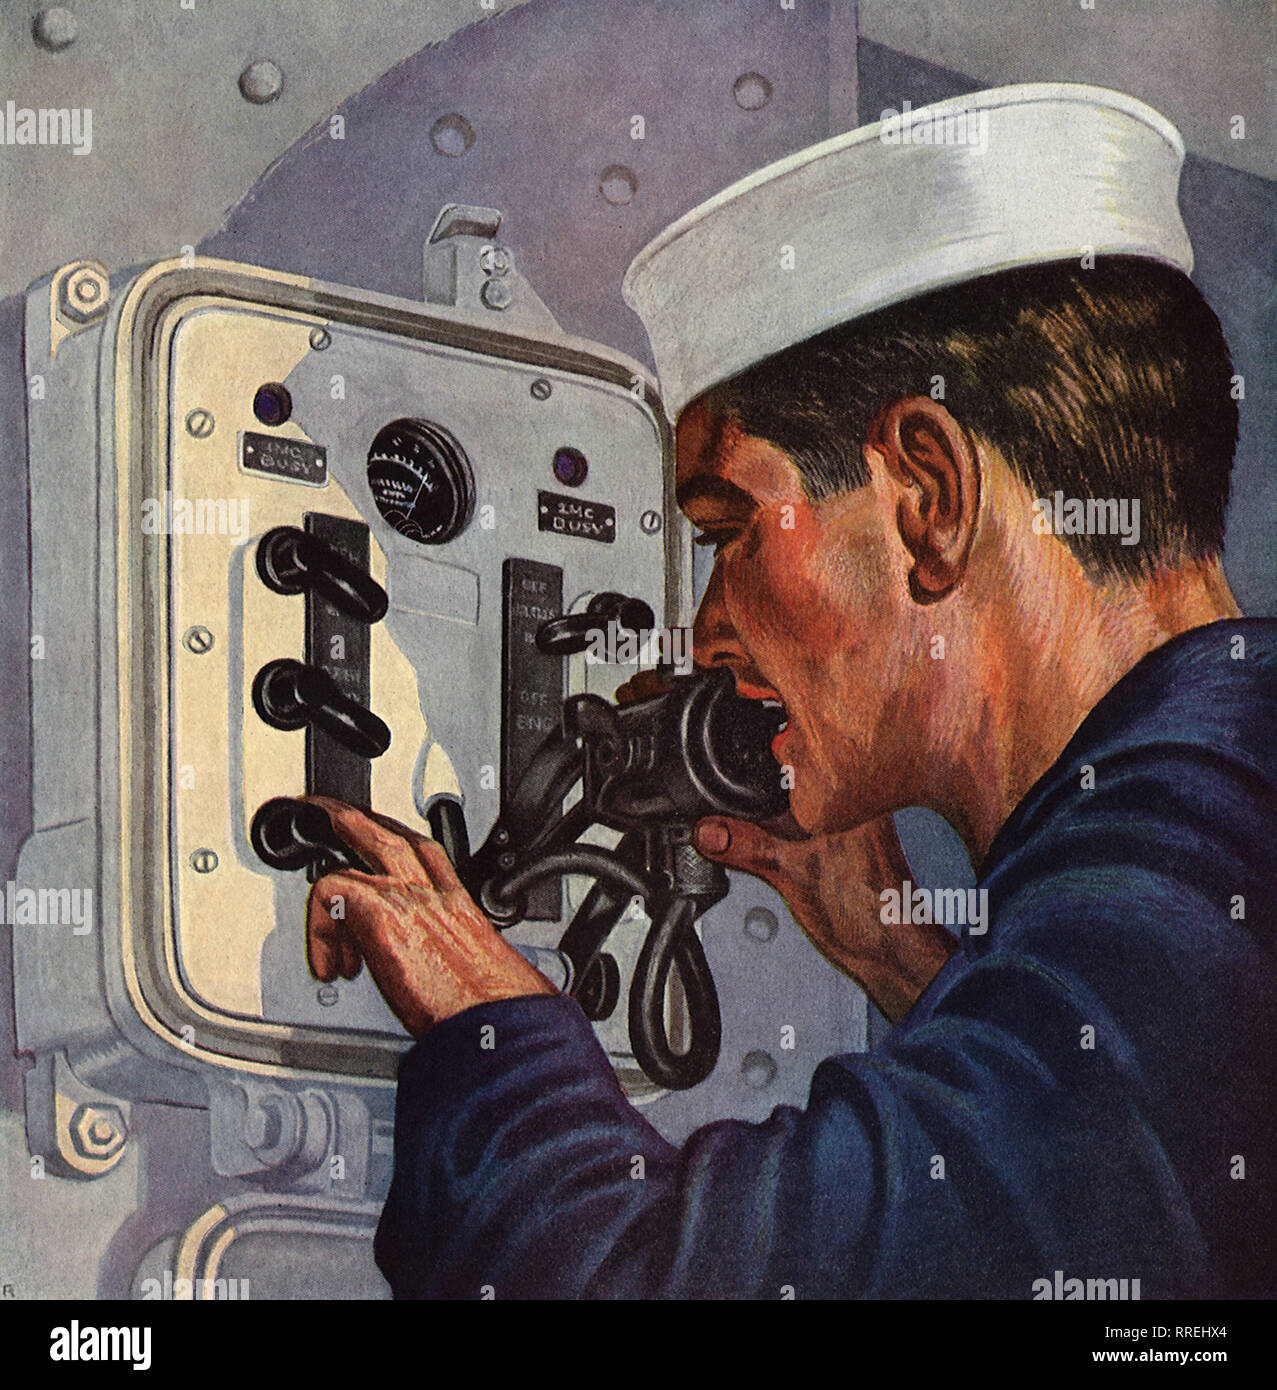 Sailor on Loud-speaking Telephone. - Stock Image